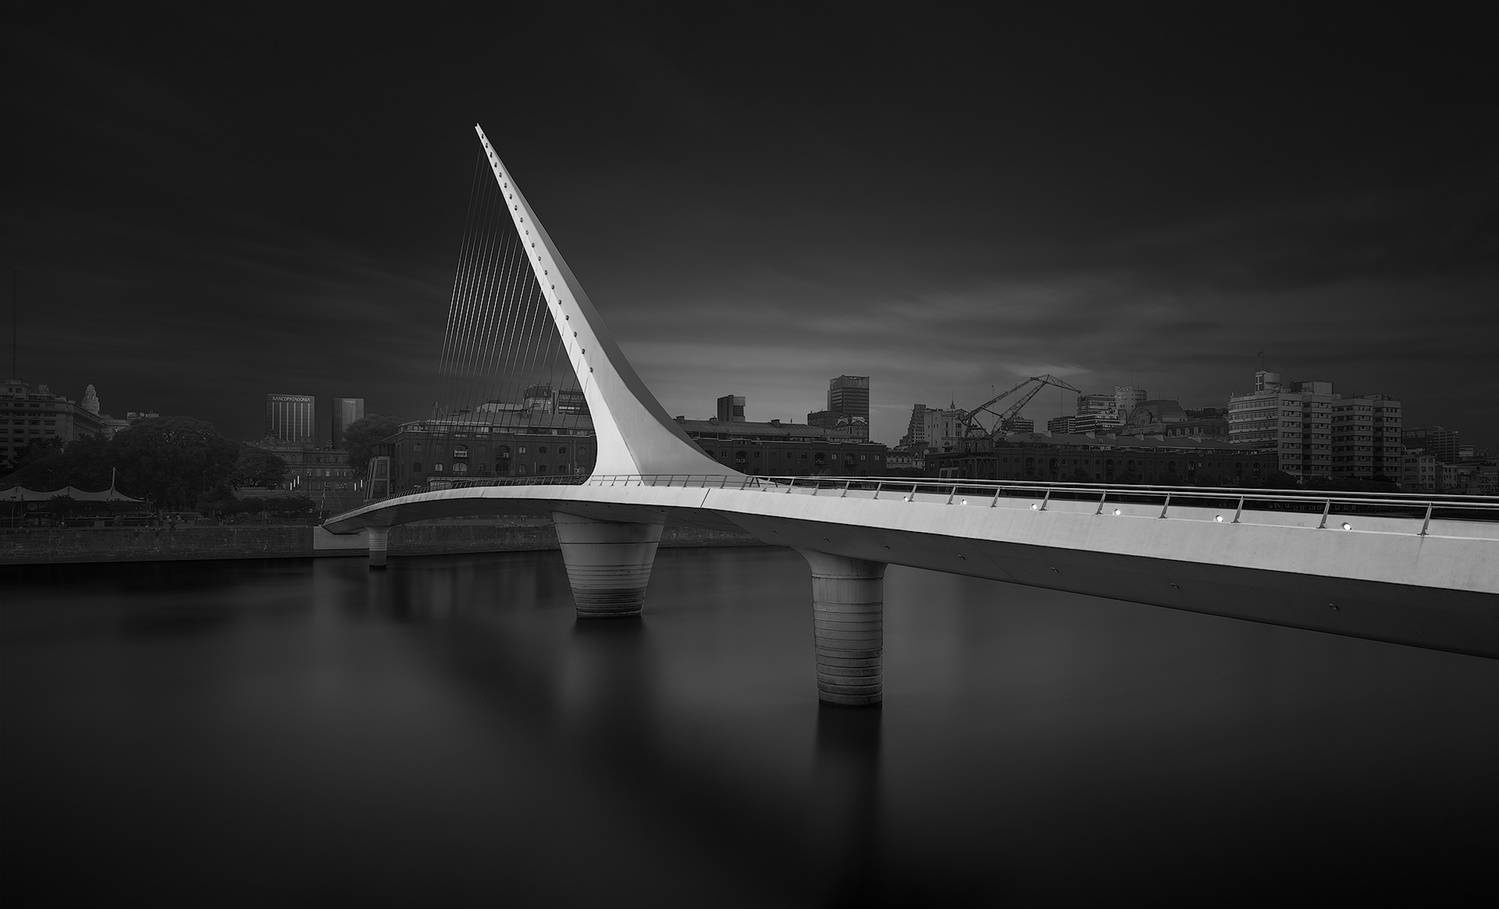 Women's bridge - Buenos Aires, Argentina by Léo Fontanel